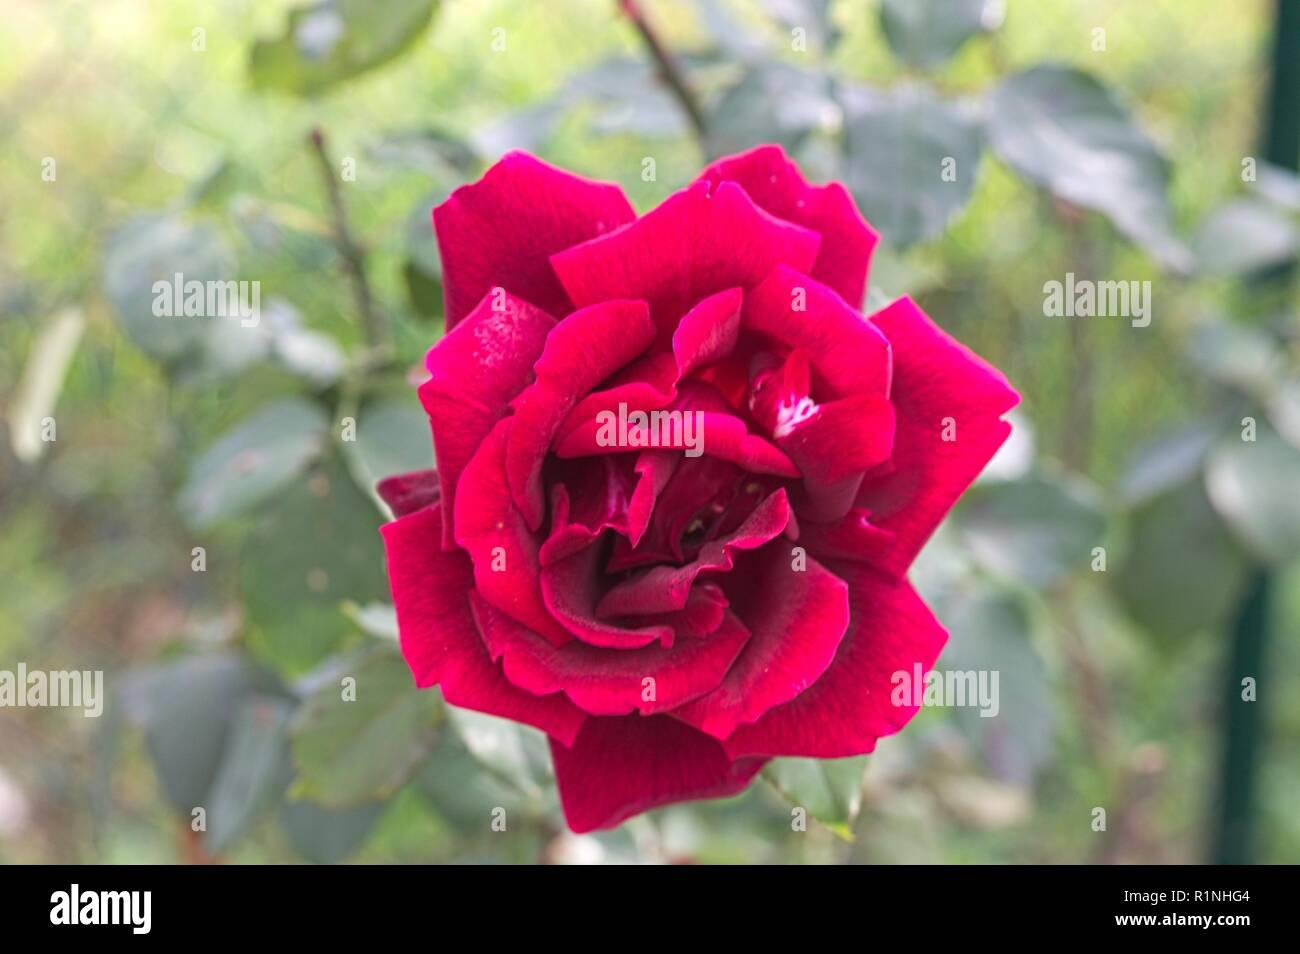 Fuchsia rose isolated in the garden (Pesaro, Italy, Europe) Stock Photo